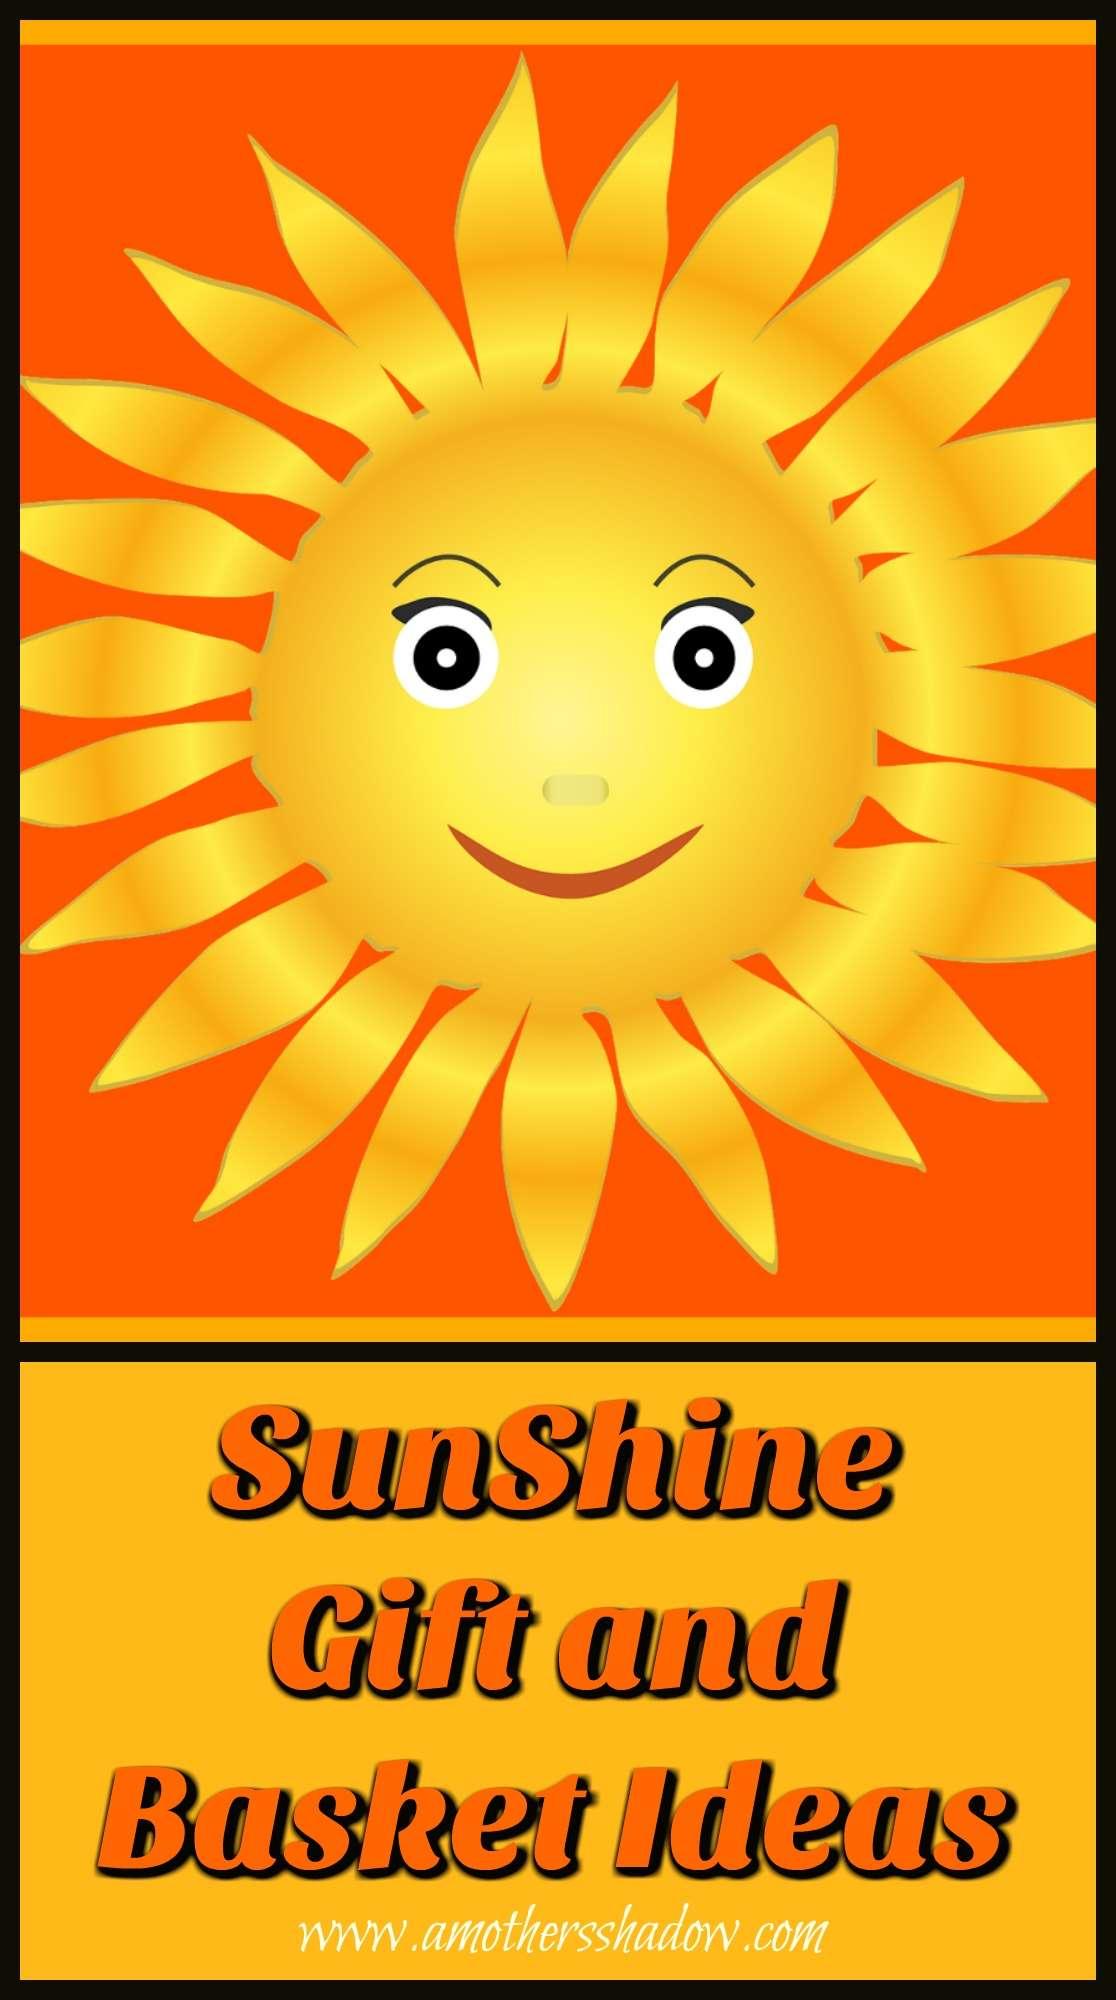 SunShine Gifts and Baskets